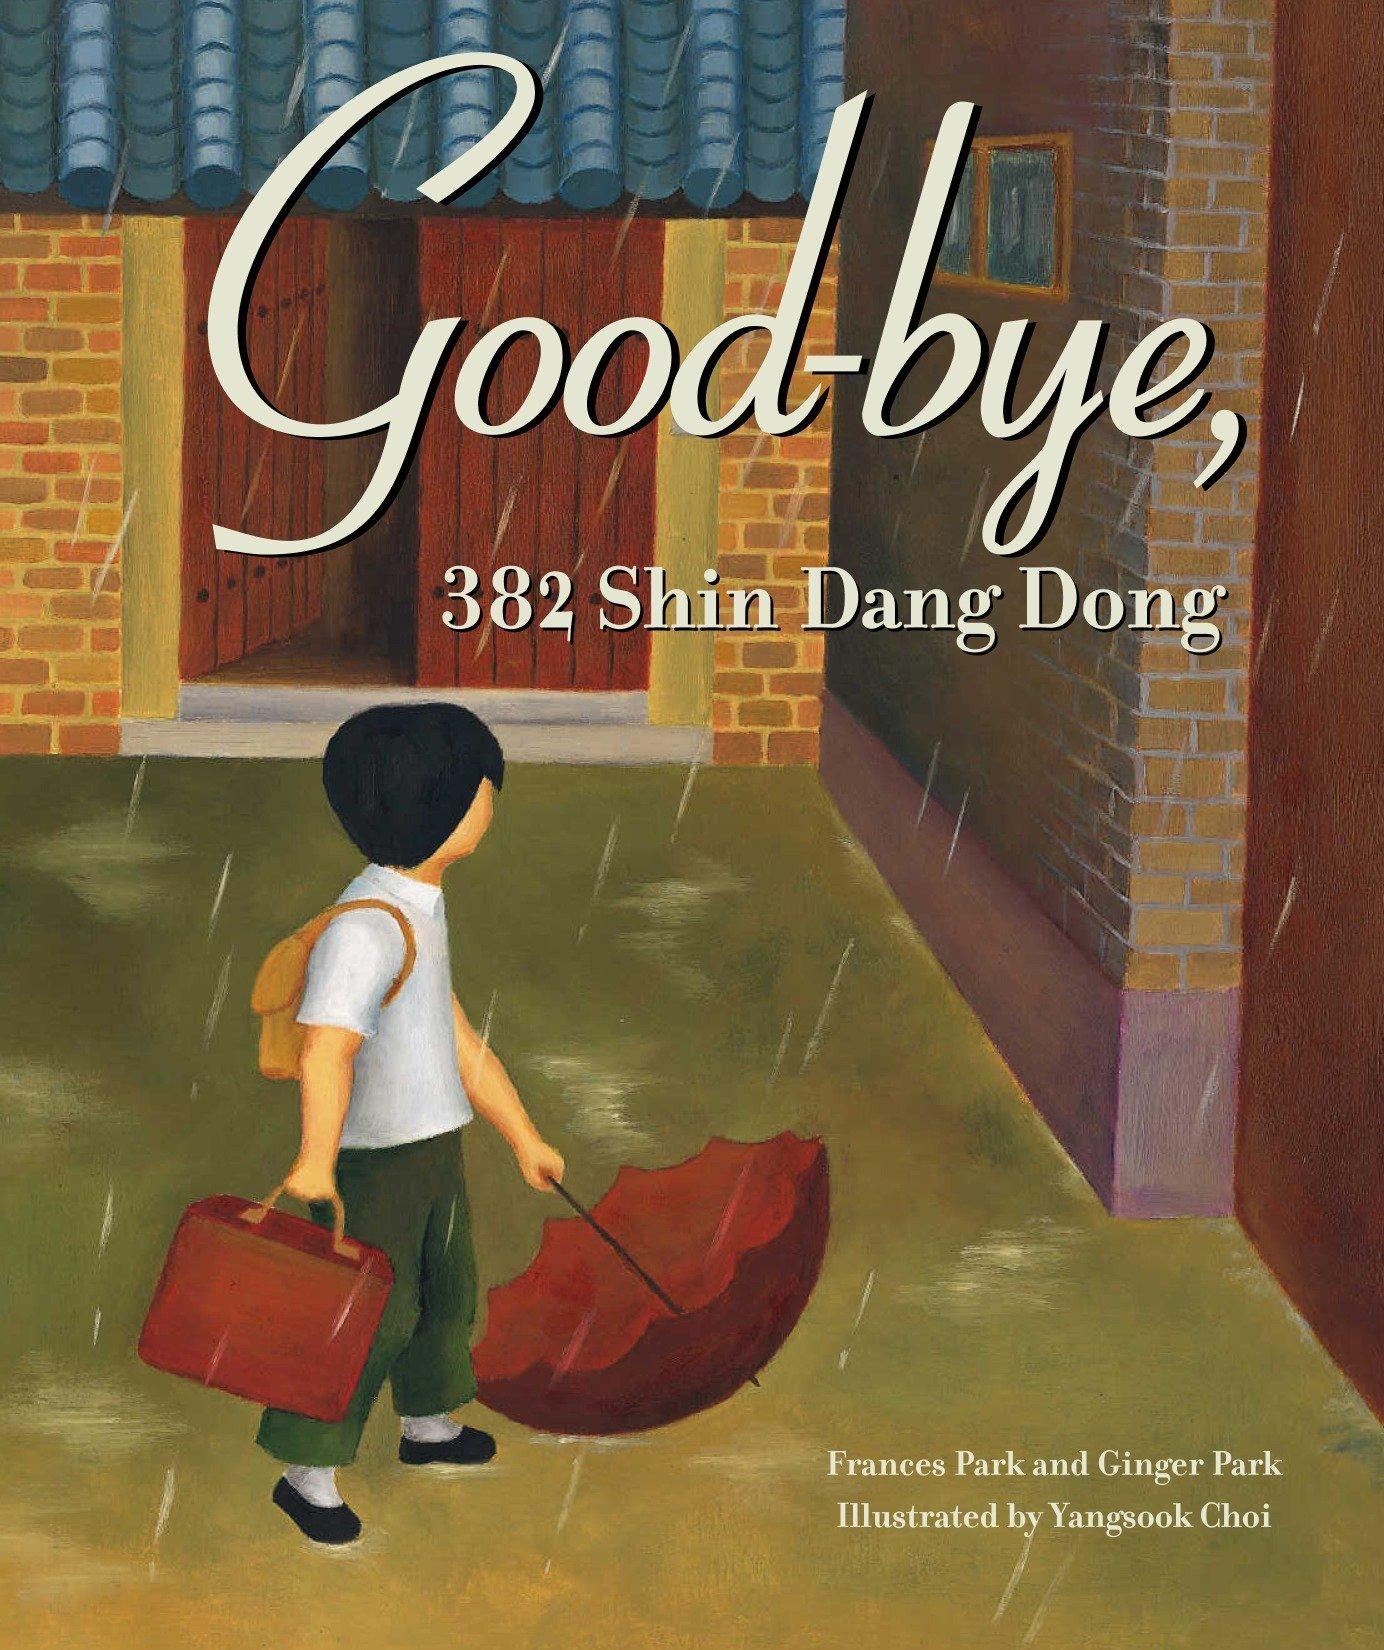 Good-Bye, 382 Shin Dang Dong: Frances Park: 9780792279853